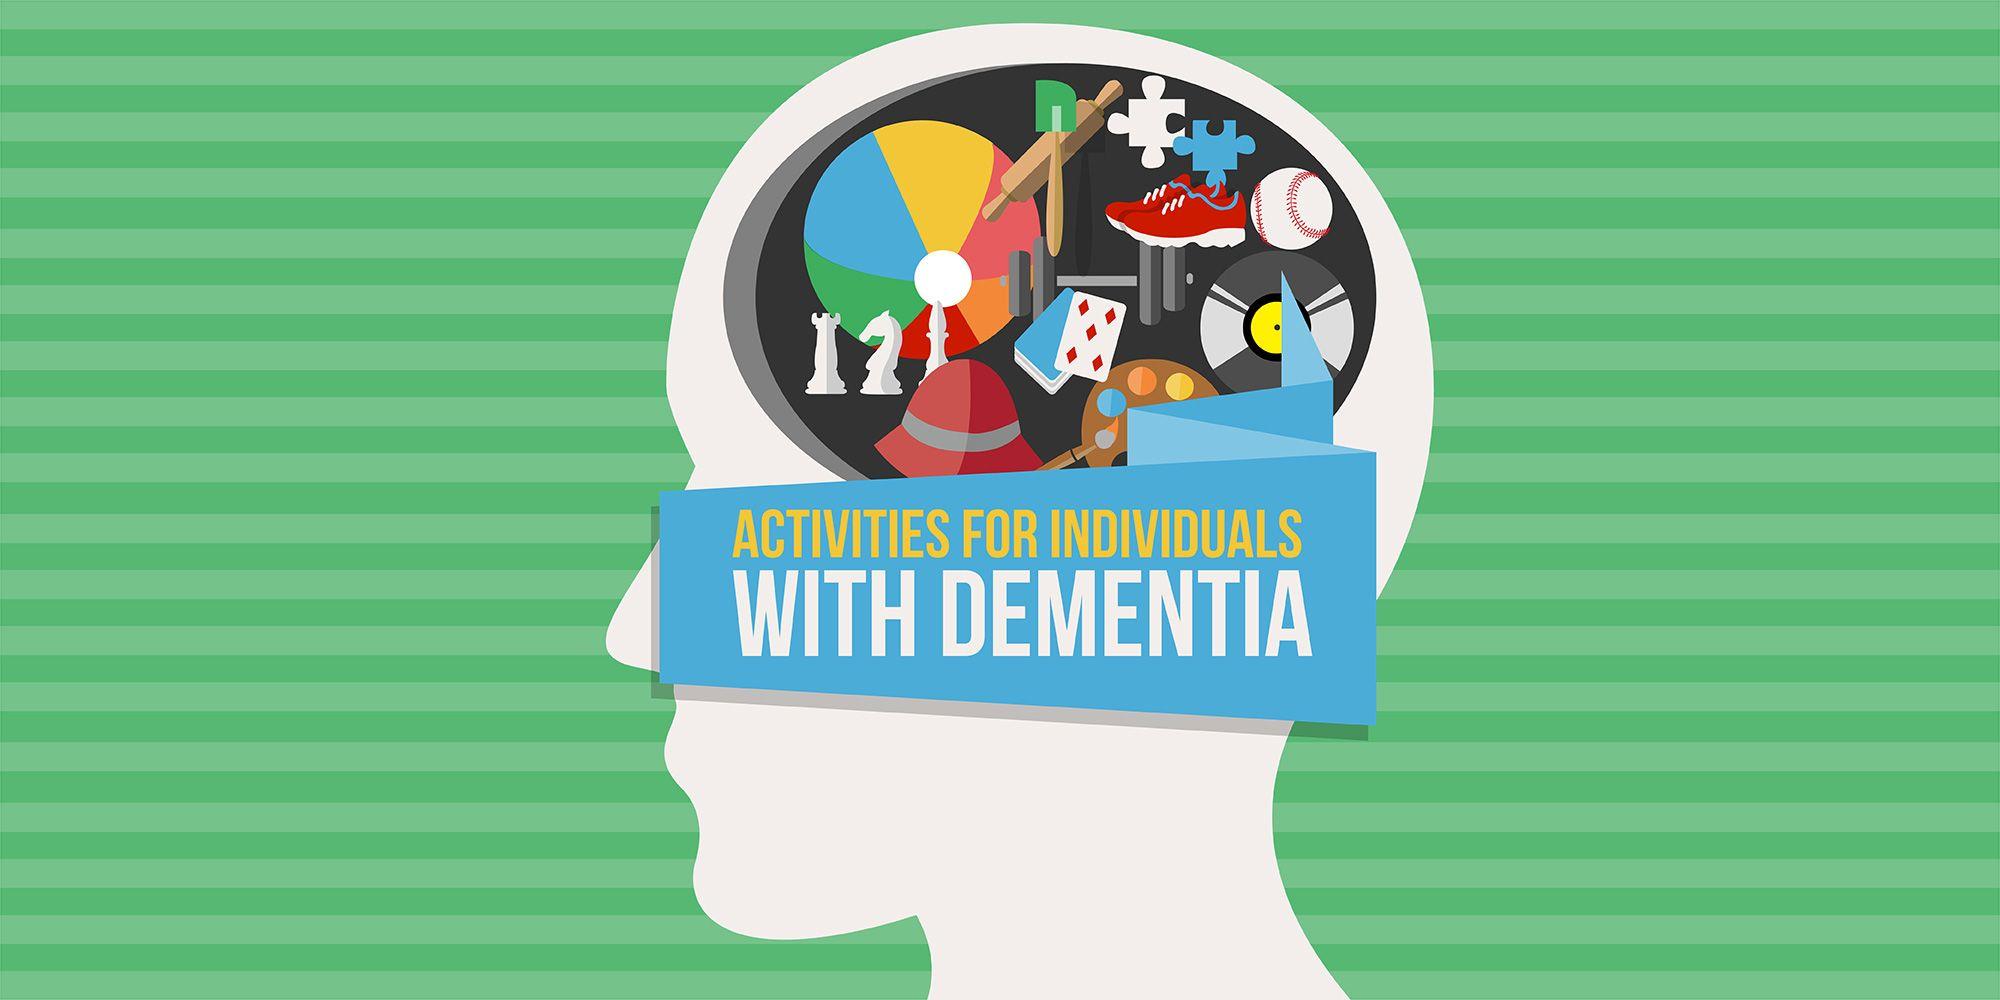 Activities For Individuals With Dementia